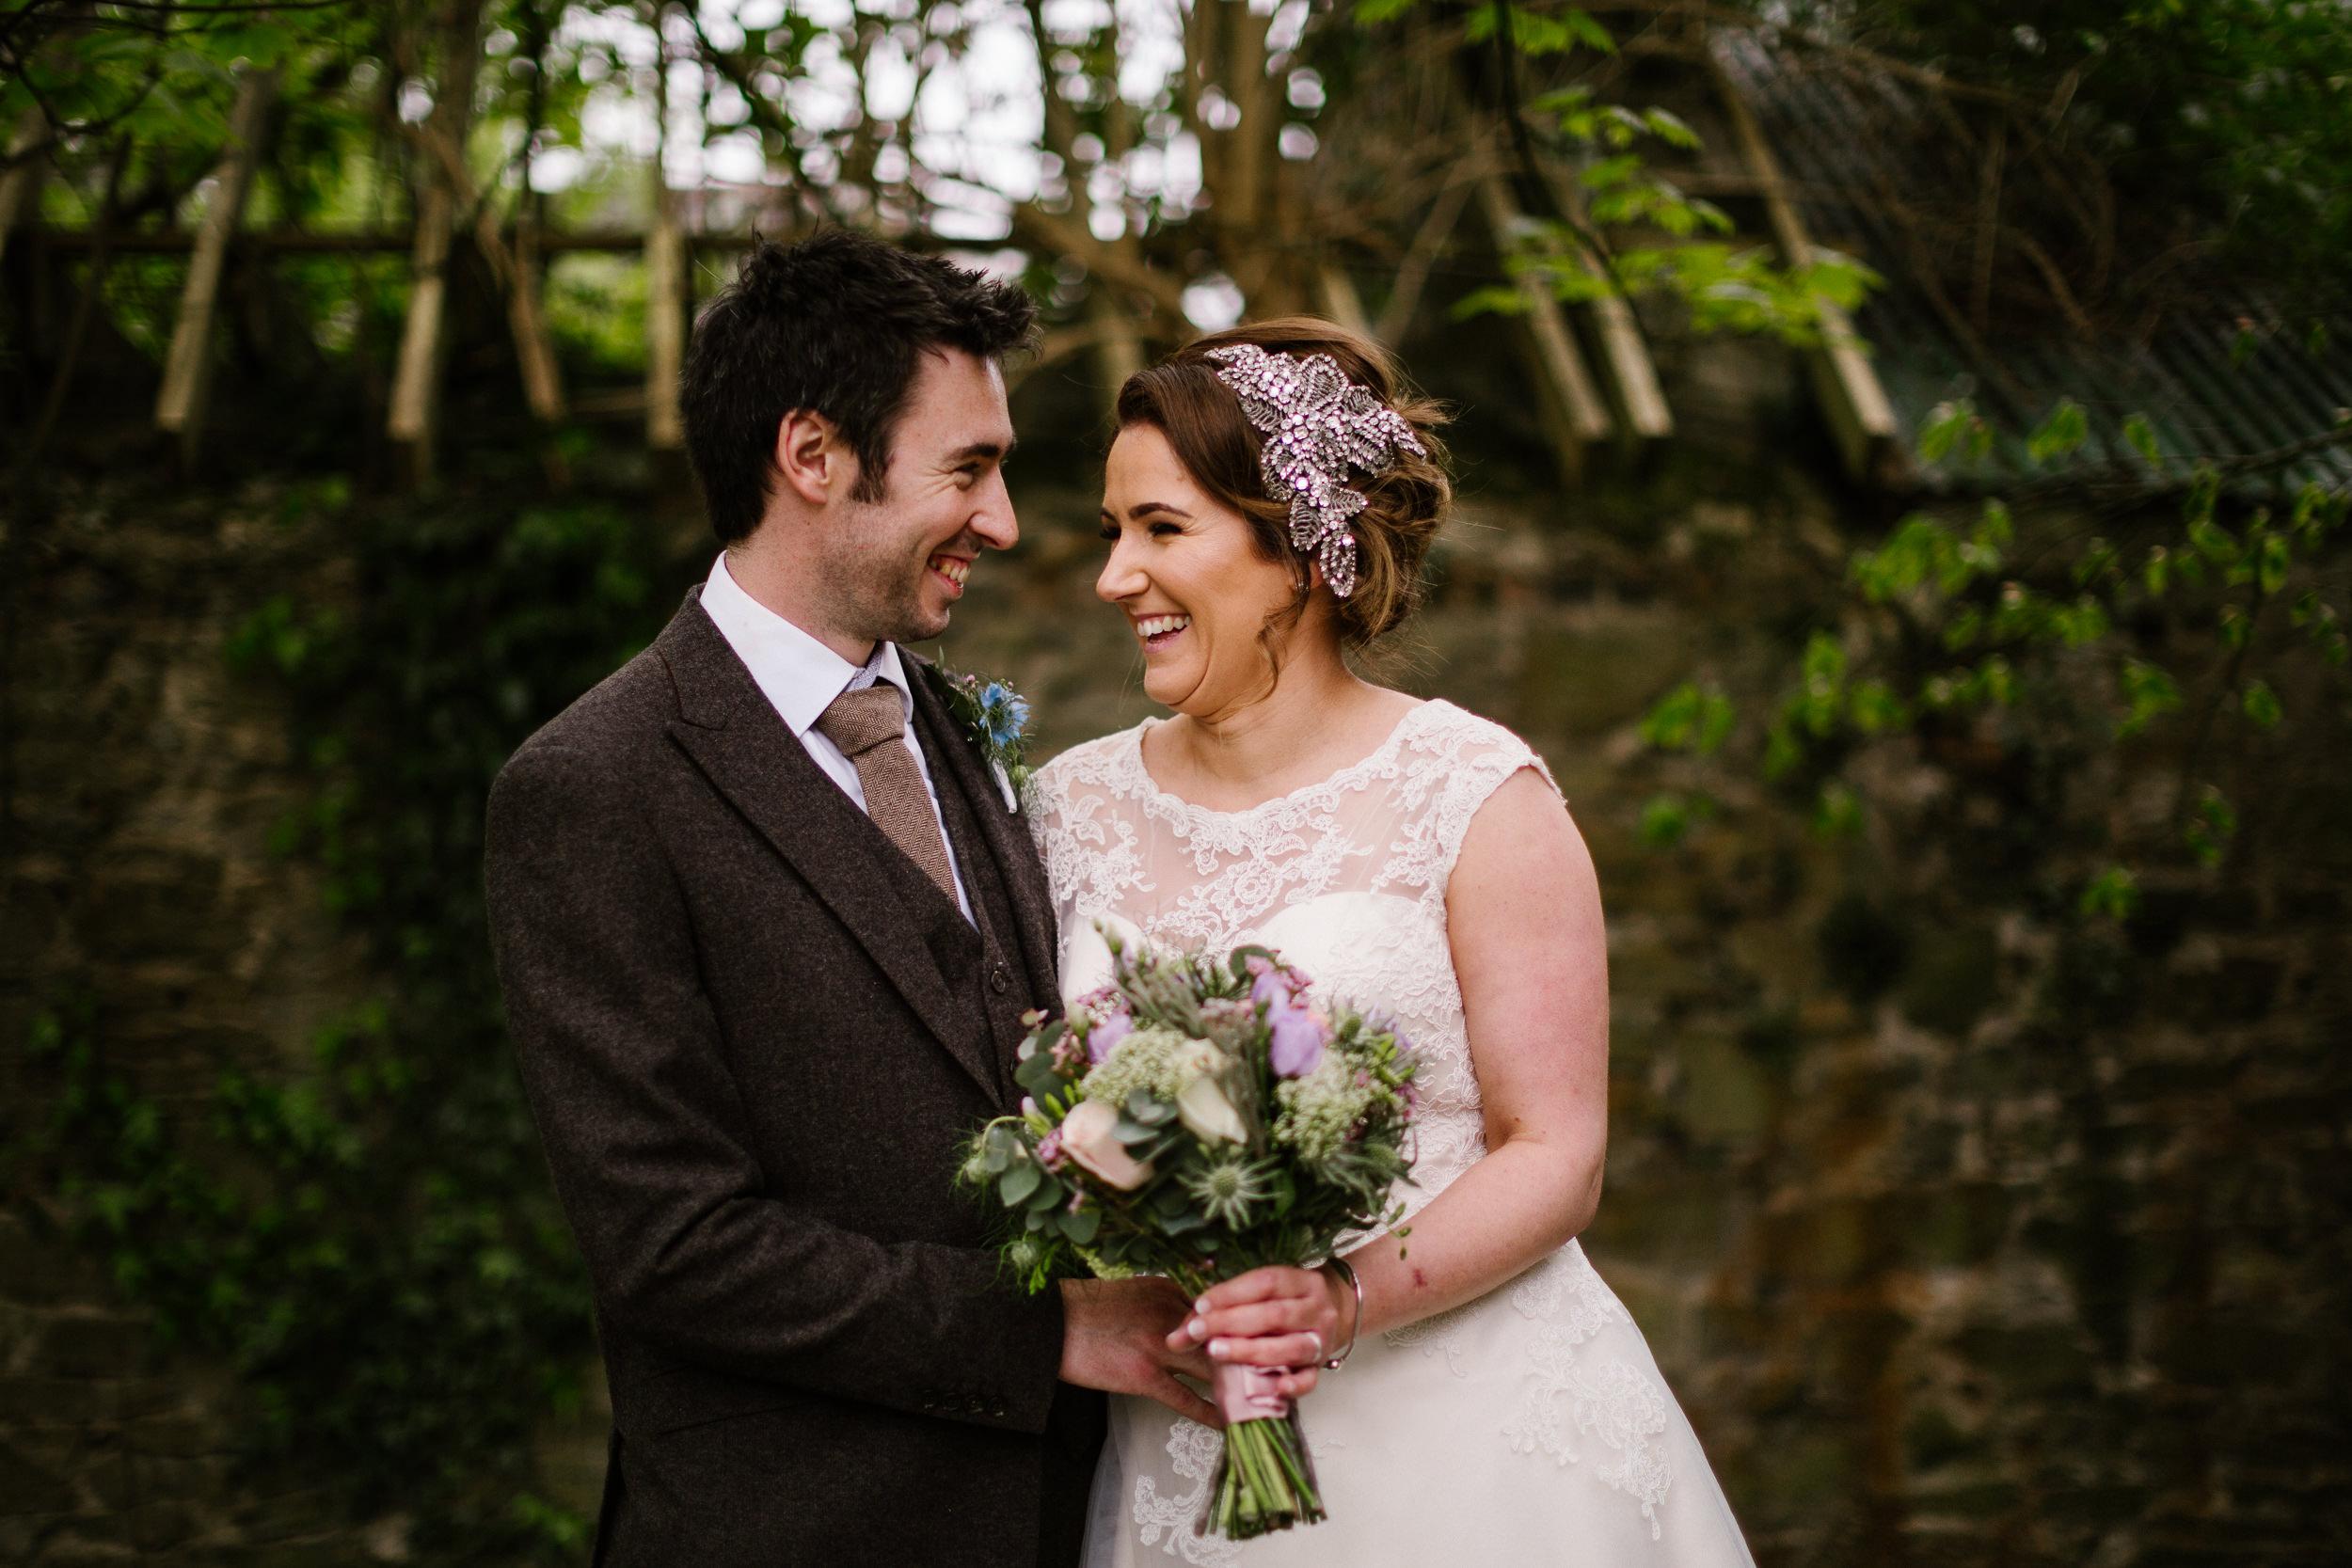 Lisa & Ruairi // Weddings // Conyngham arms